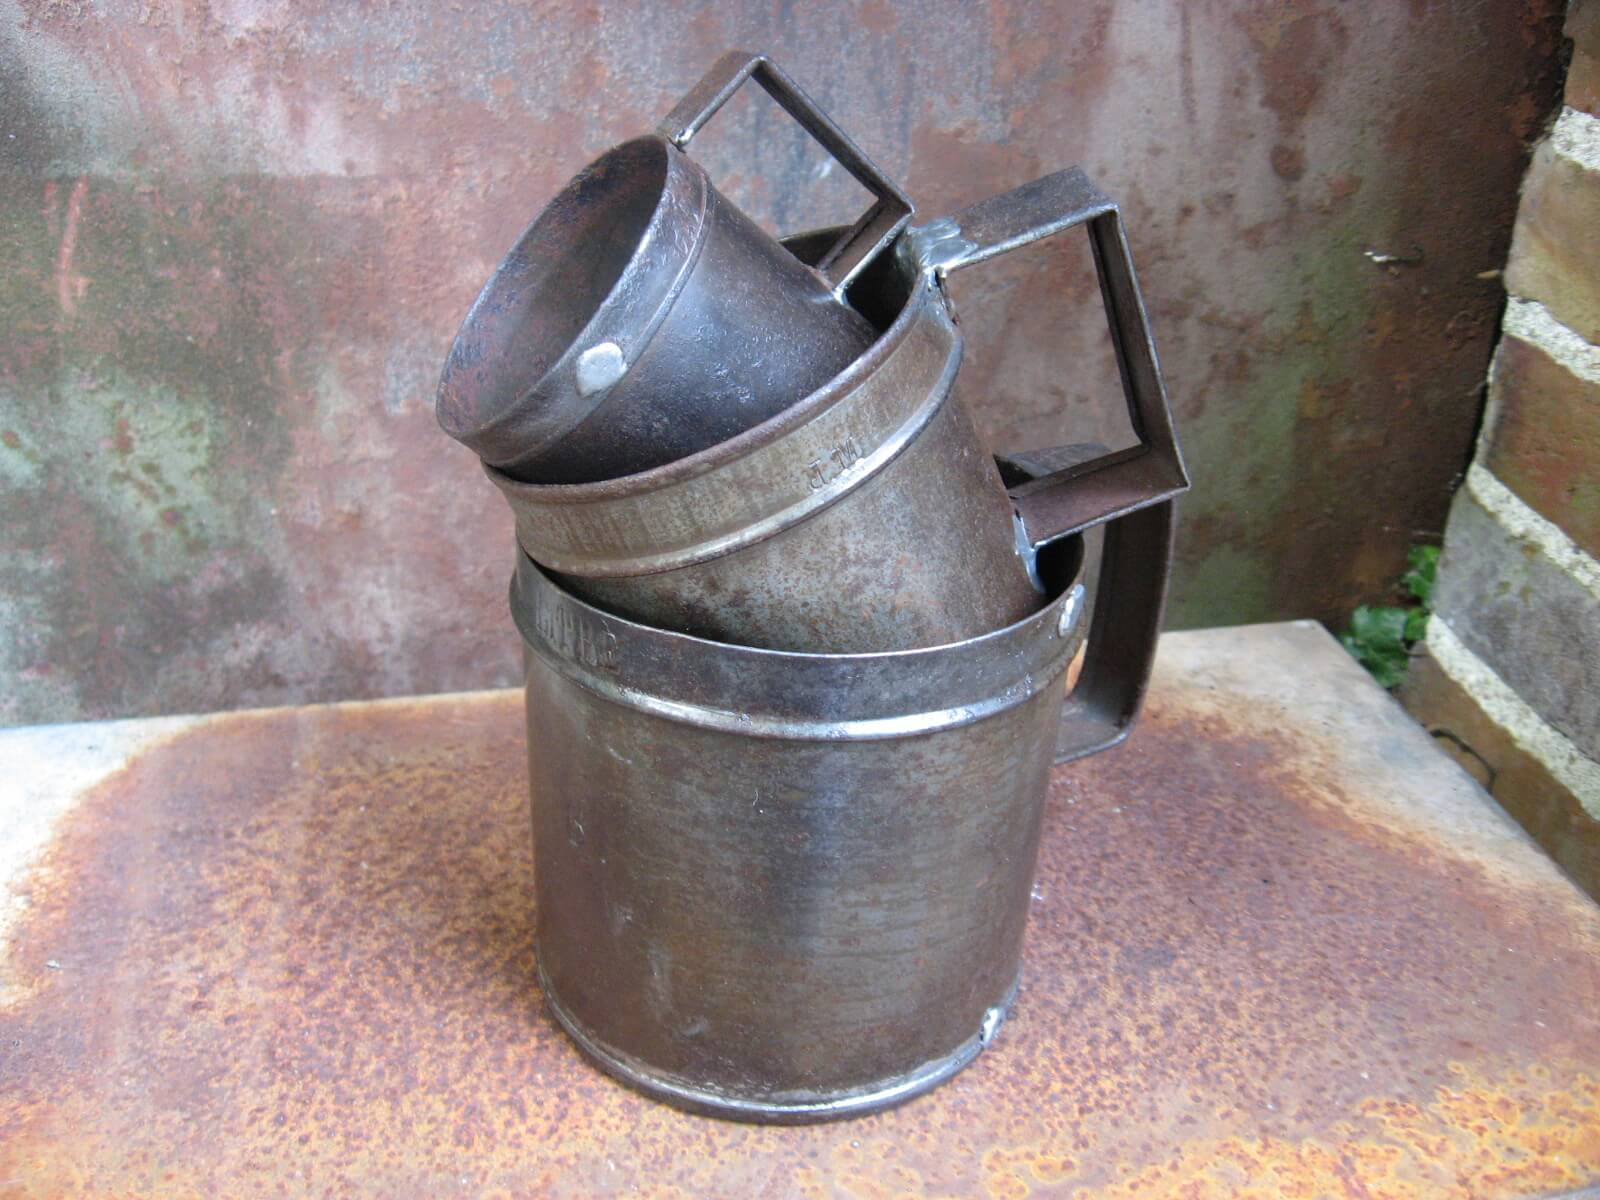 metal measuring cups litre demiliter doubledeilitre at PumpjackPiddlewick